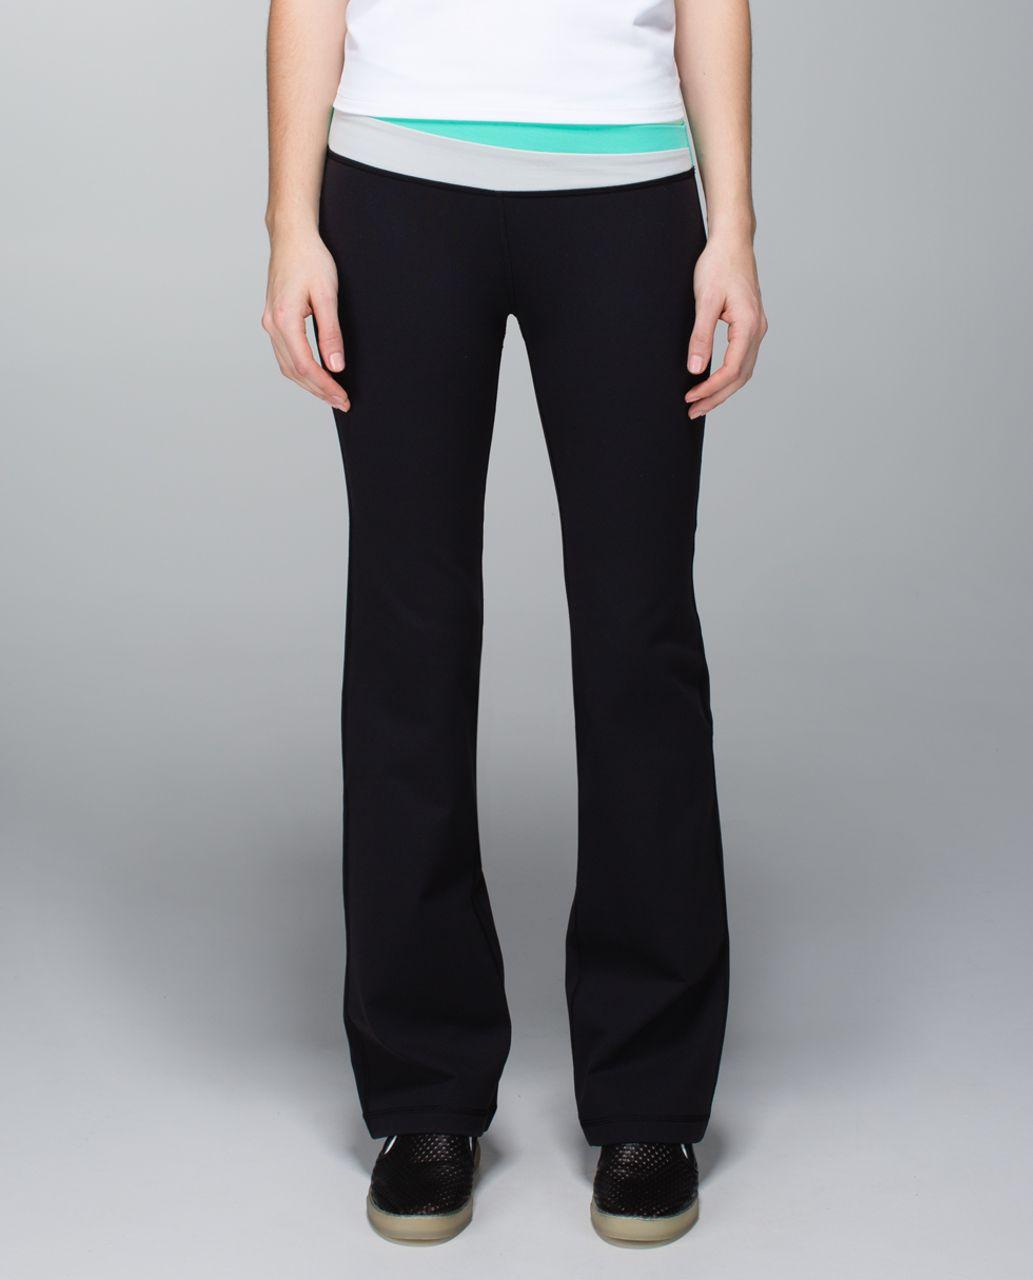 Lululemon Astro Pant (Regular) *Full-On Luon - Black / Bali Breeze / Fresh Teal